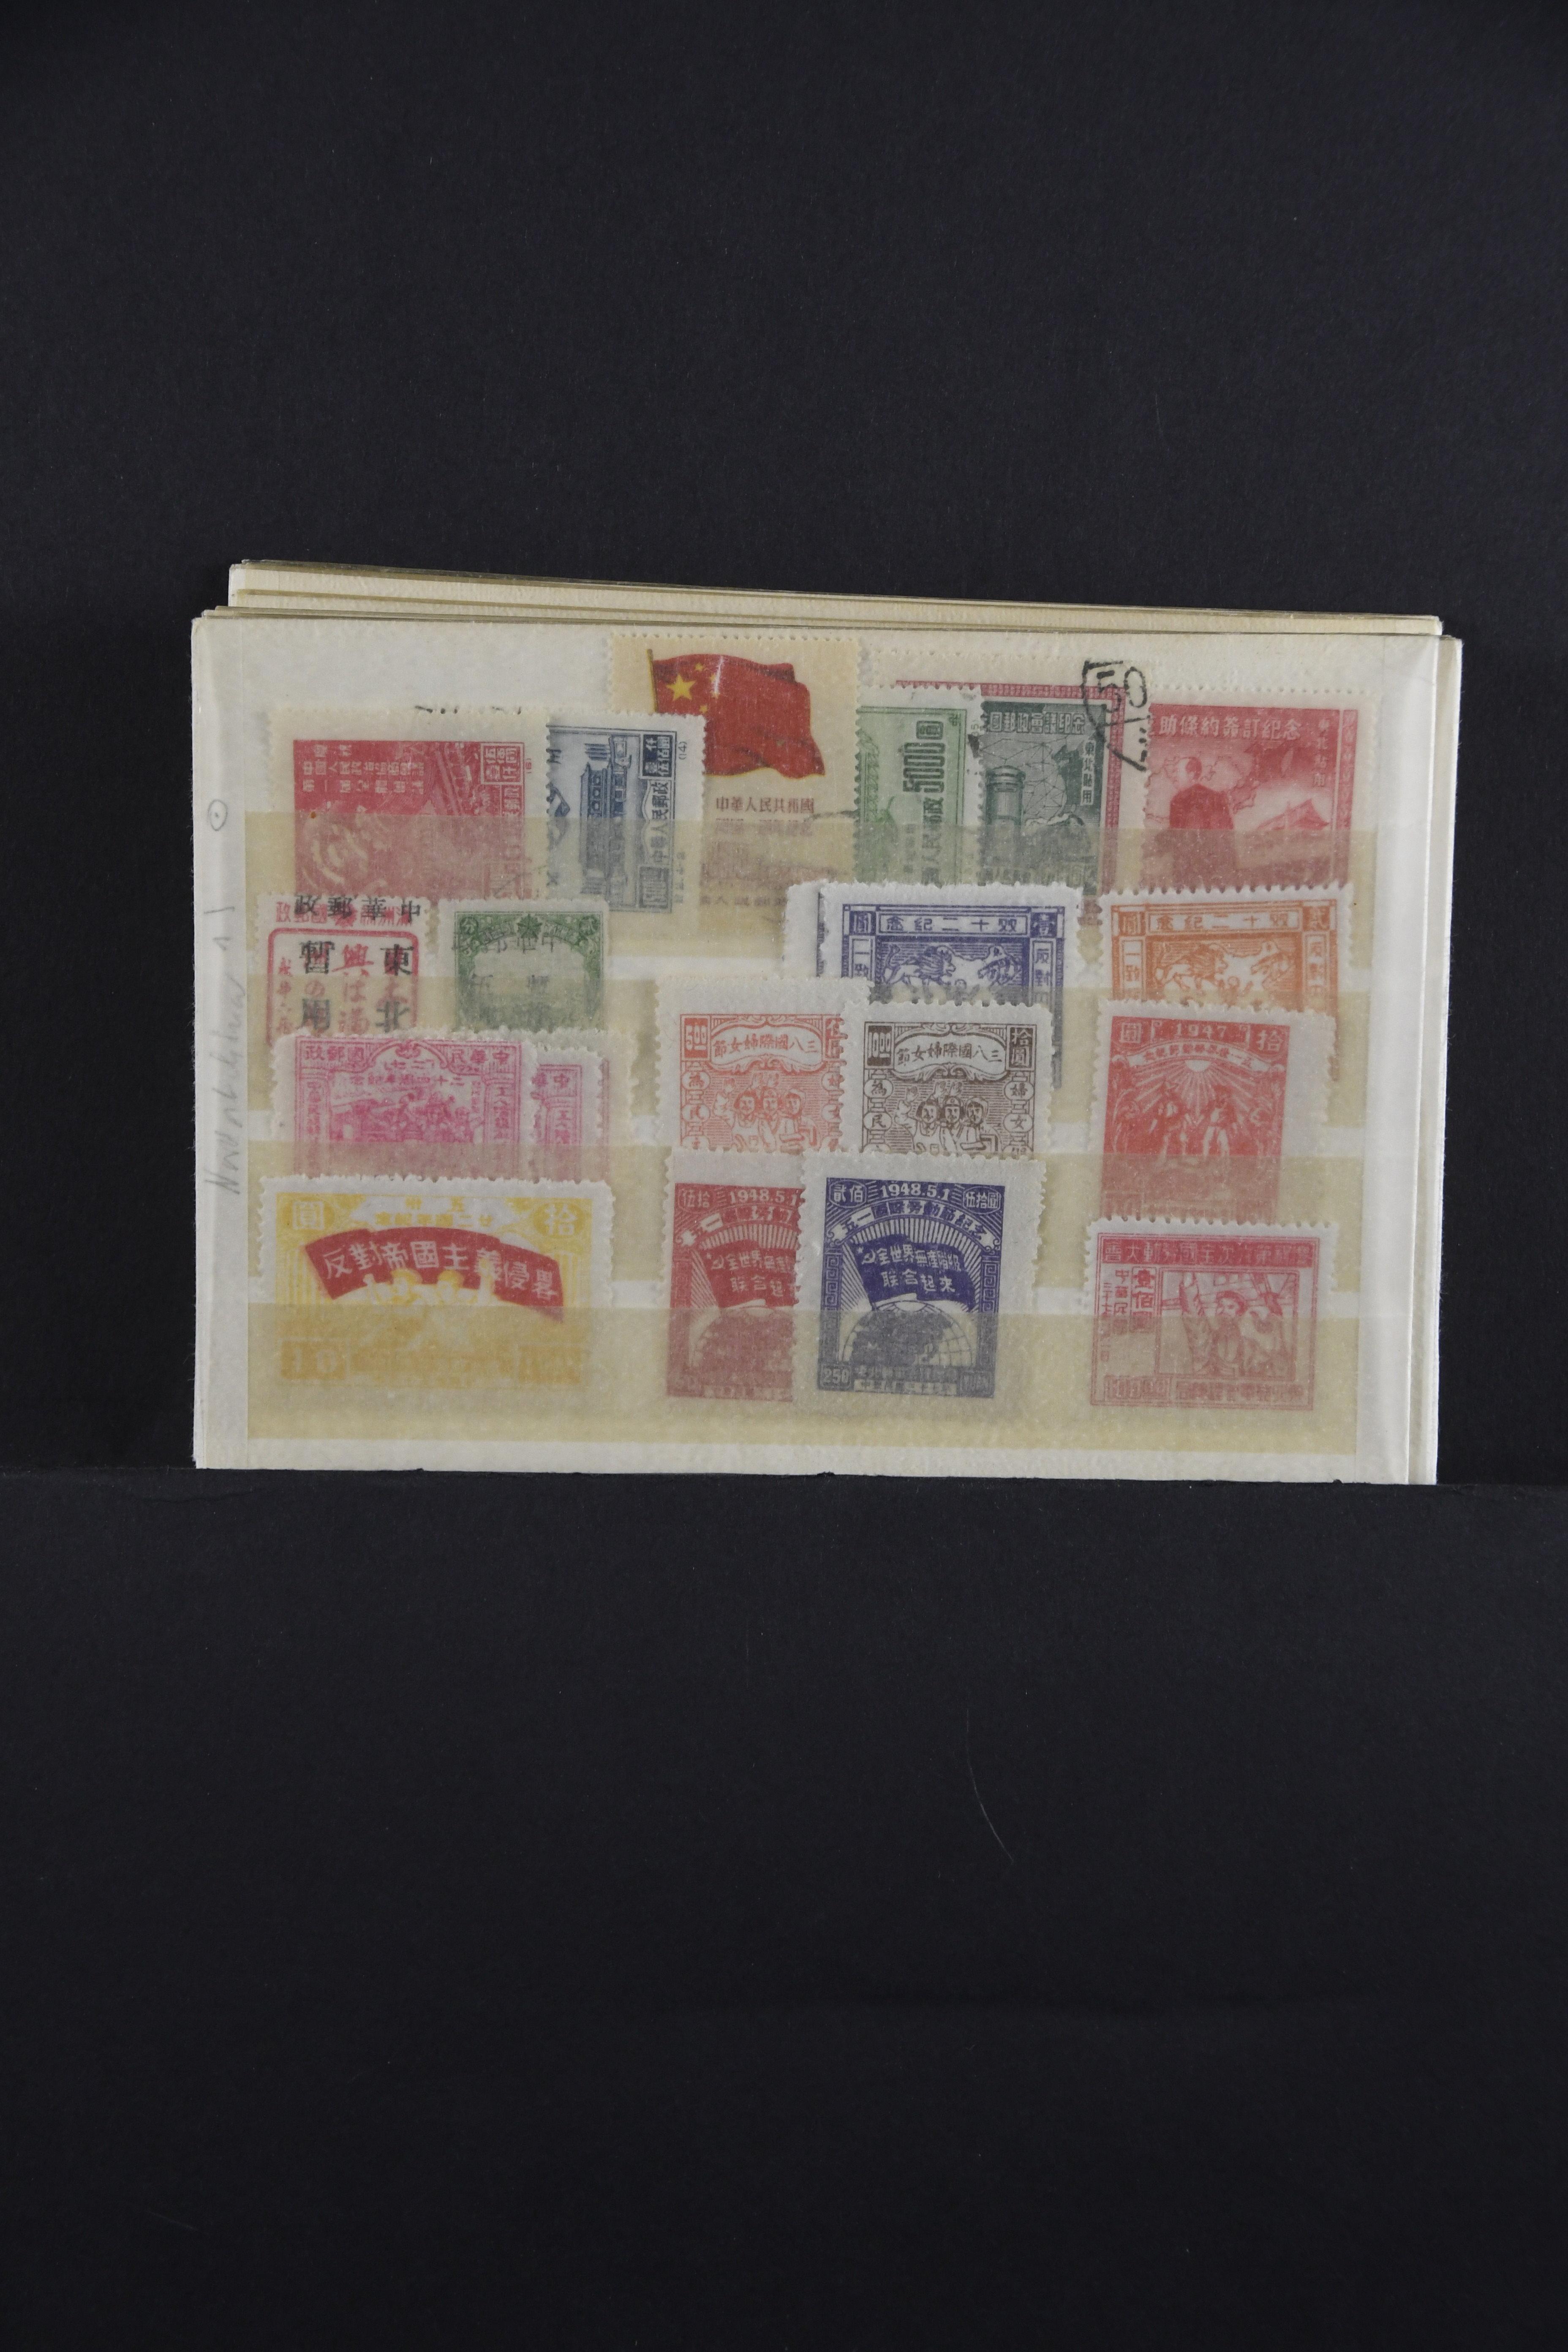 Lot 6465 - Übersee A-Z China Markenausgaben S -  Auktionshaus Ulrich Felzmann GmbH & Co. KG Auction 169